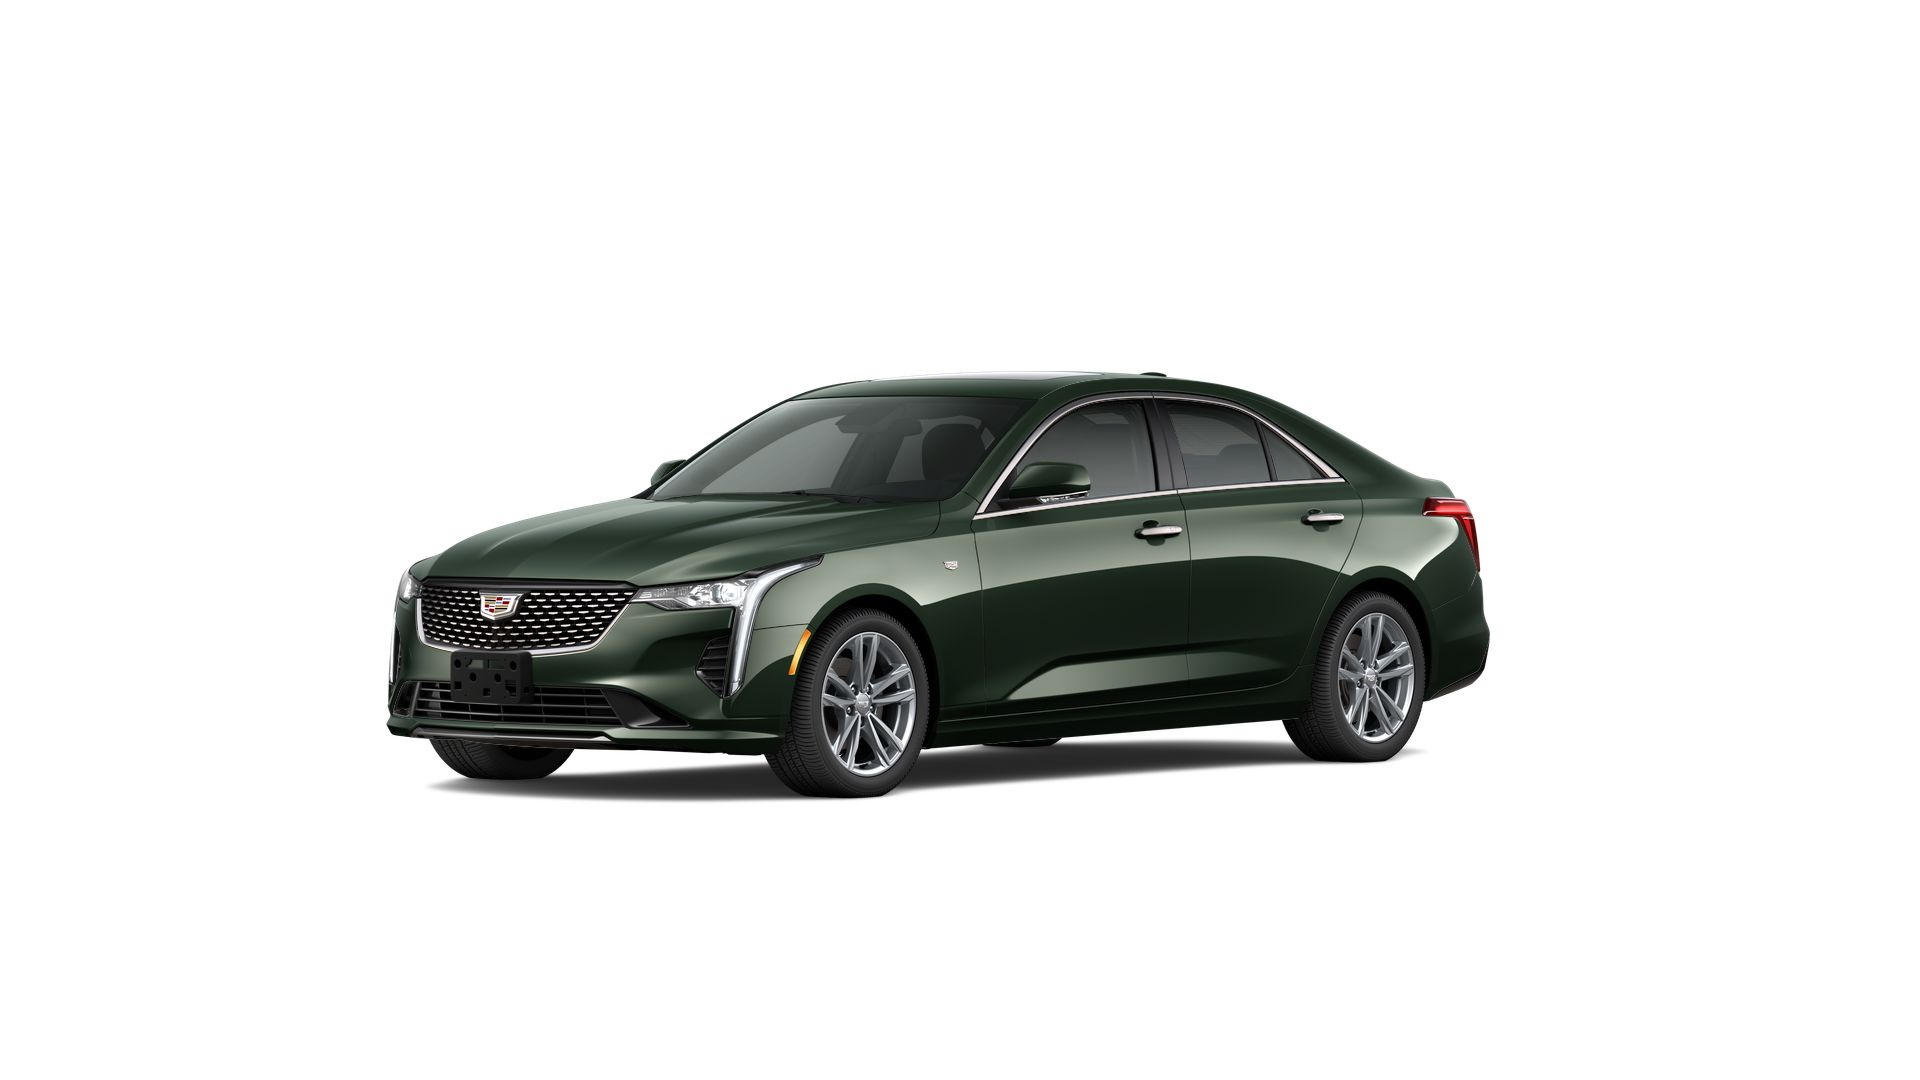 2021 CT4 Luxury AWD $389